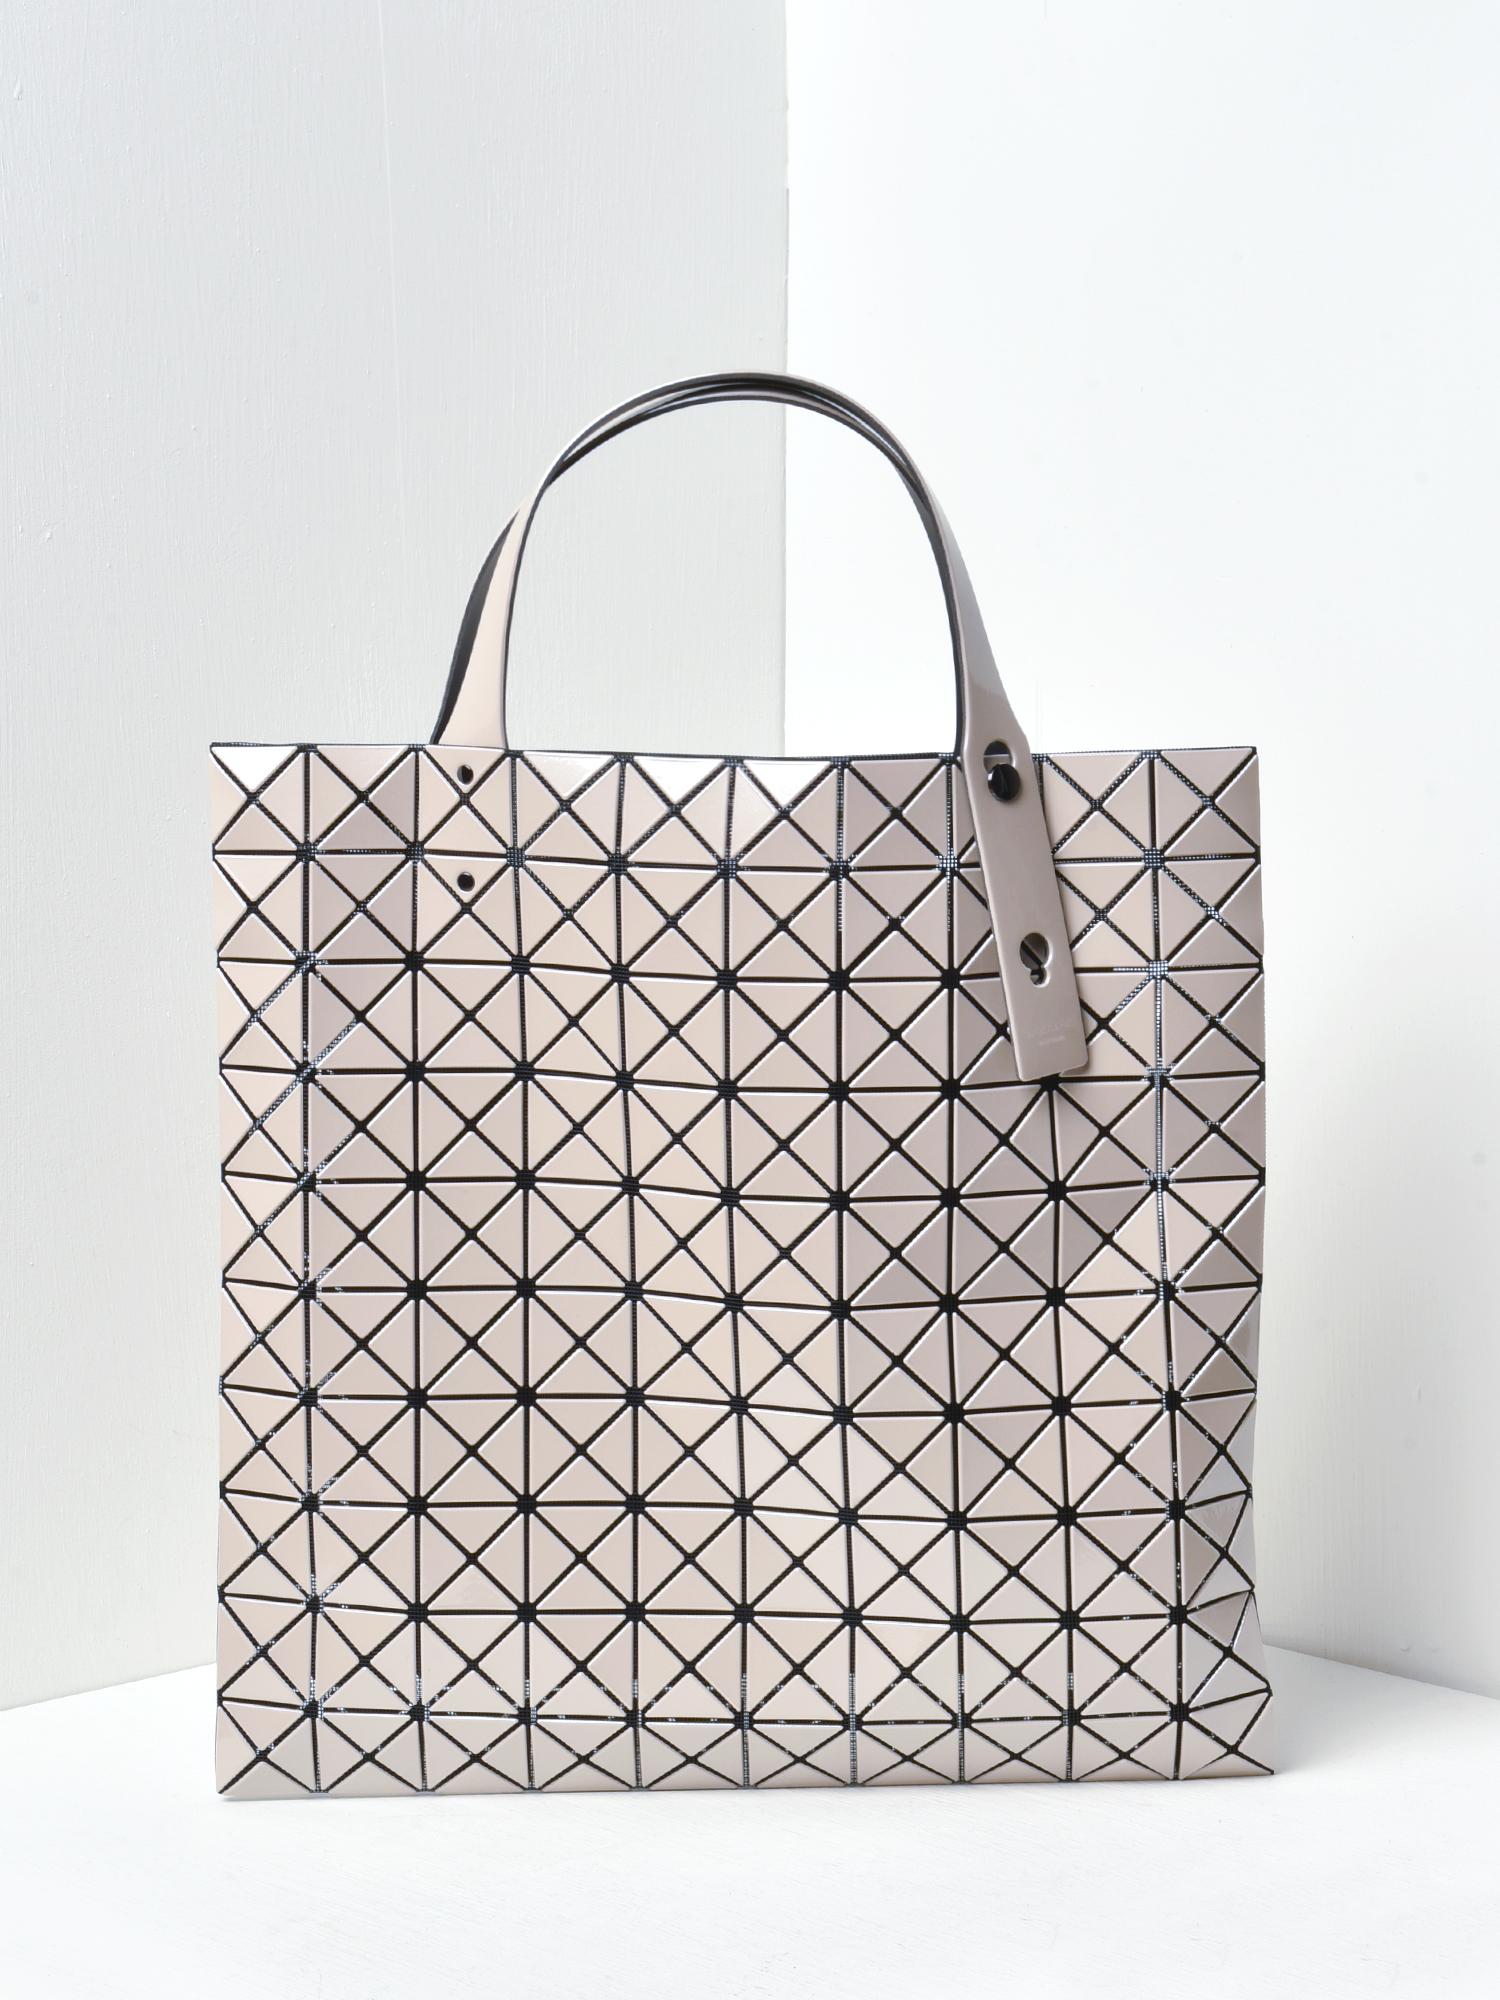 Bao Bao Issey Miyake Prism Bag Beige Garmentory